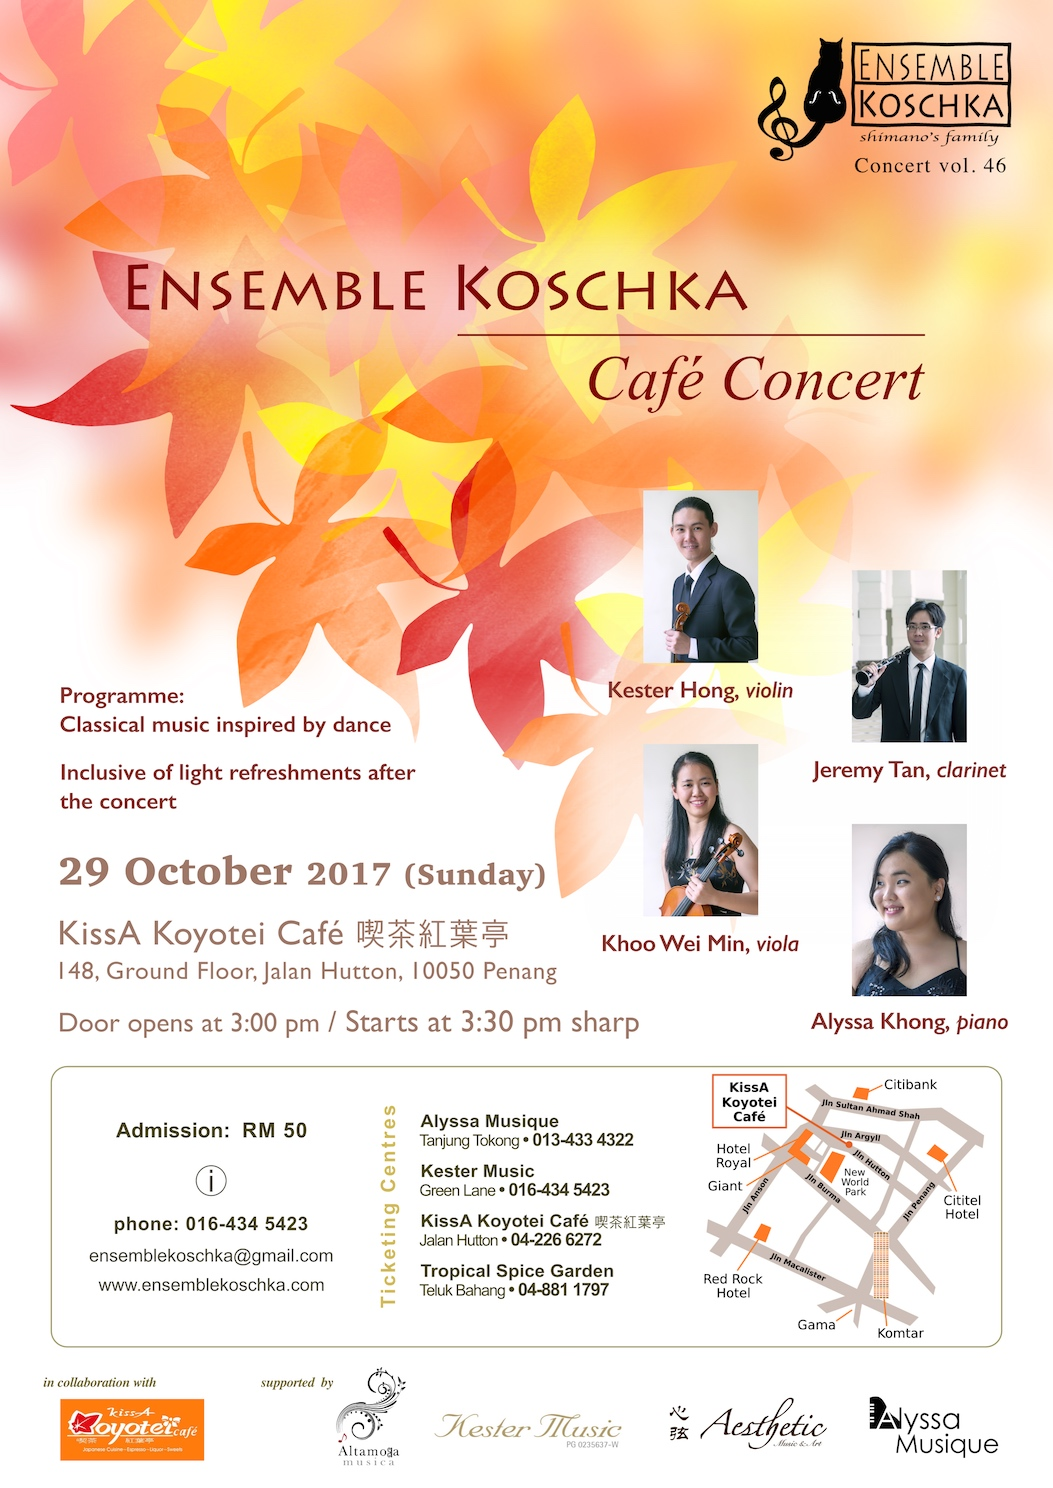 Ensemble Koschka Concert vol. 46: Café Concert